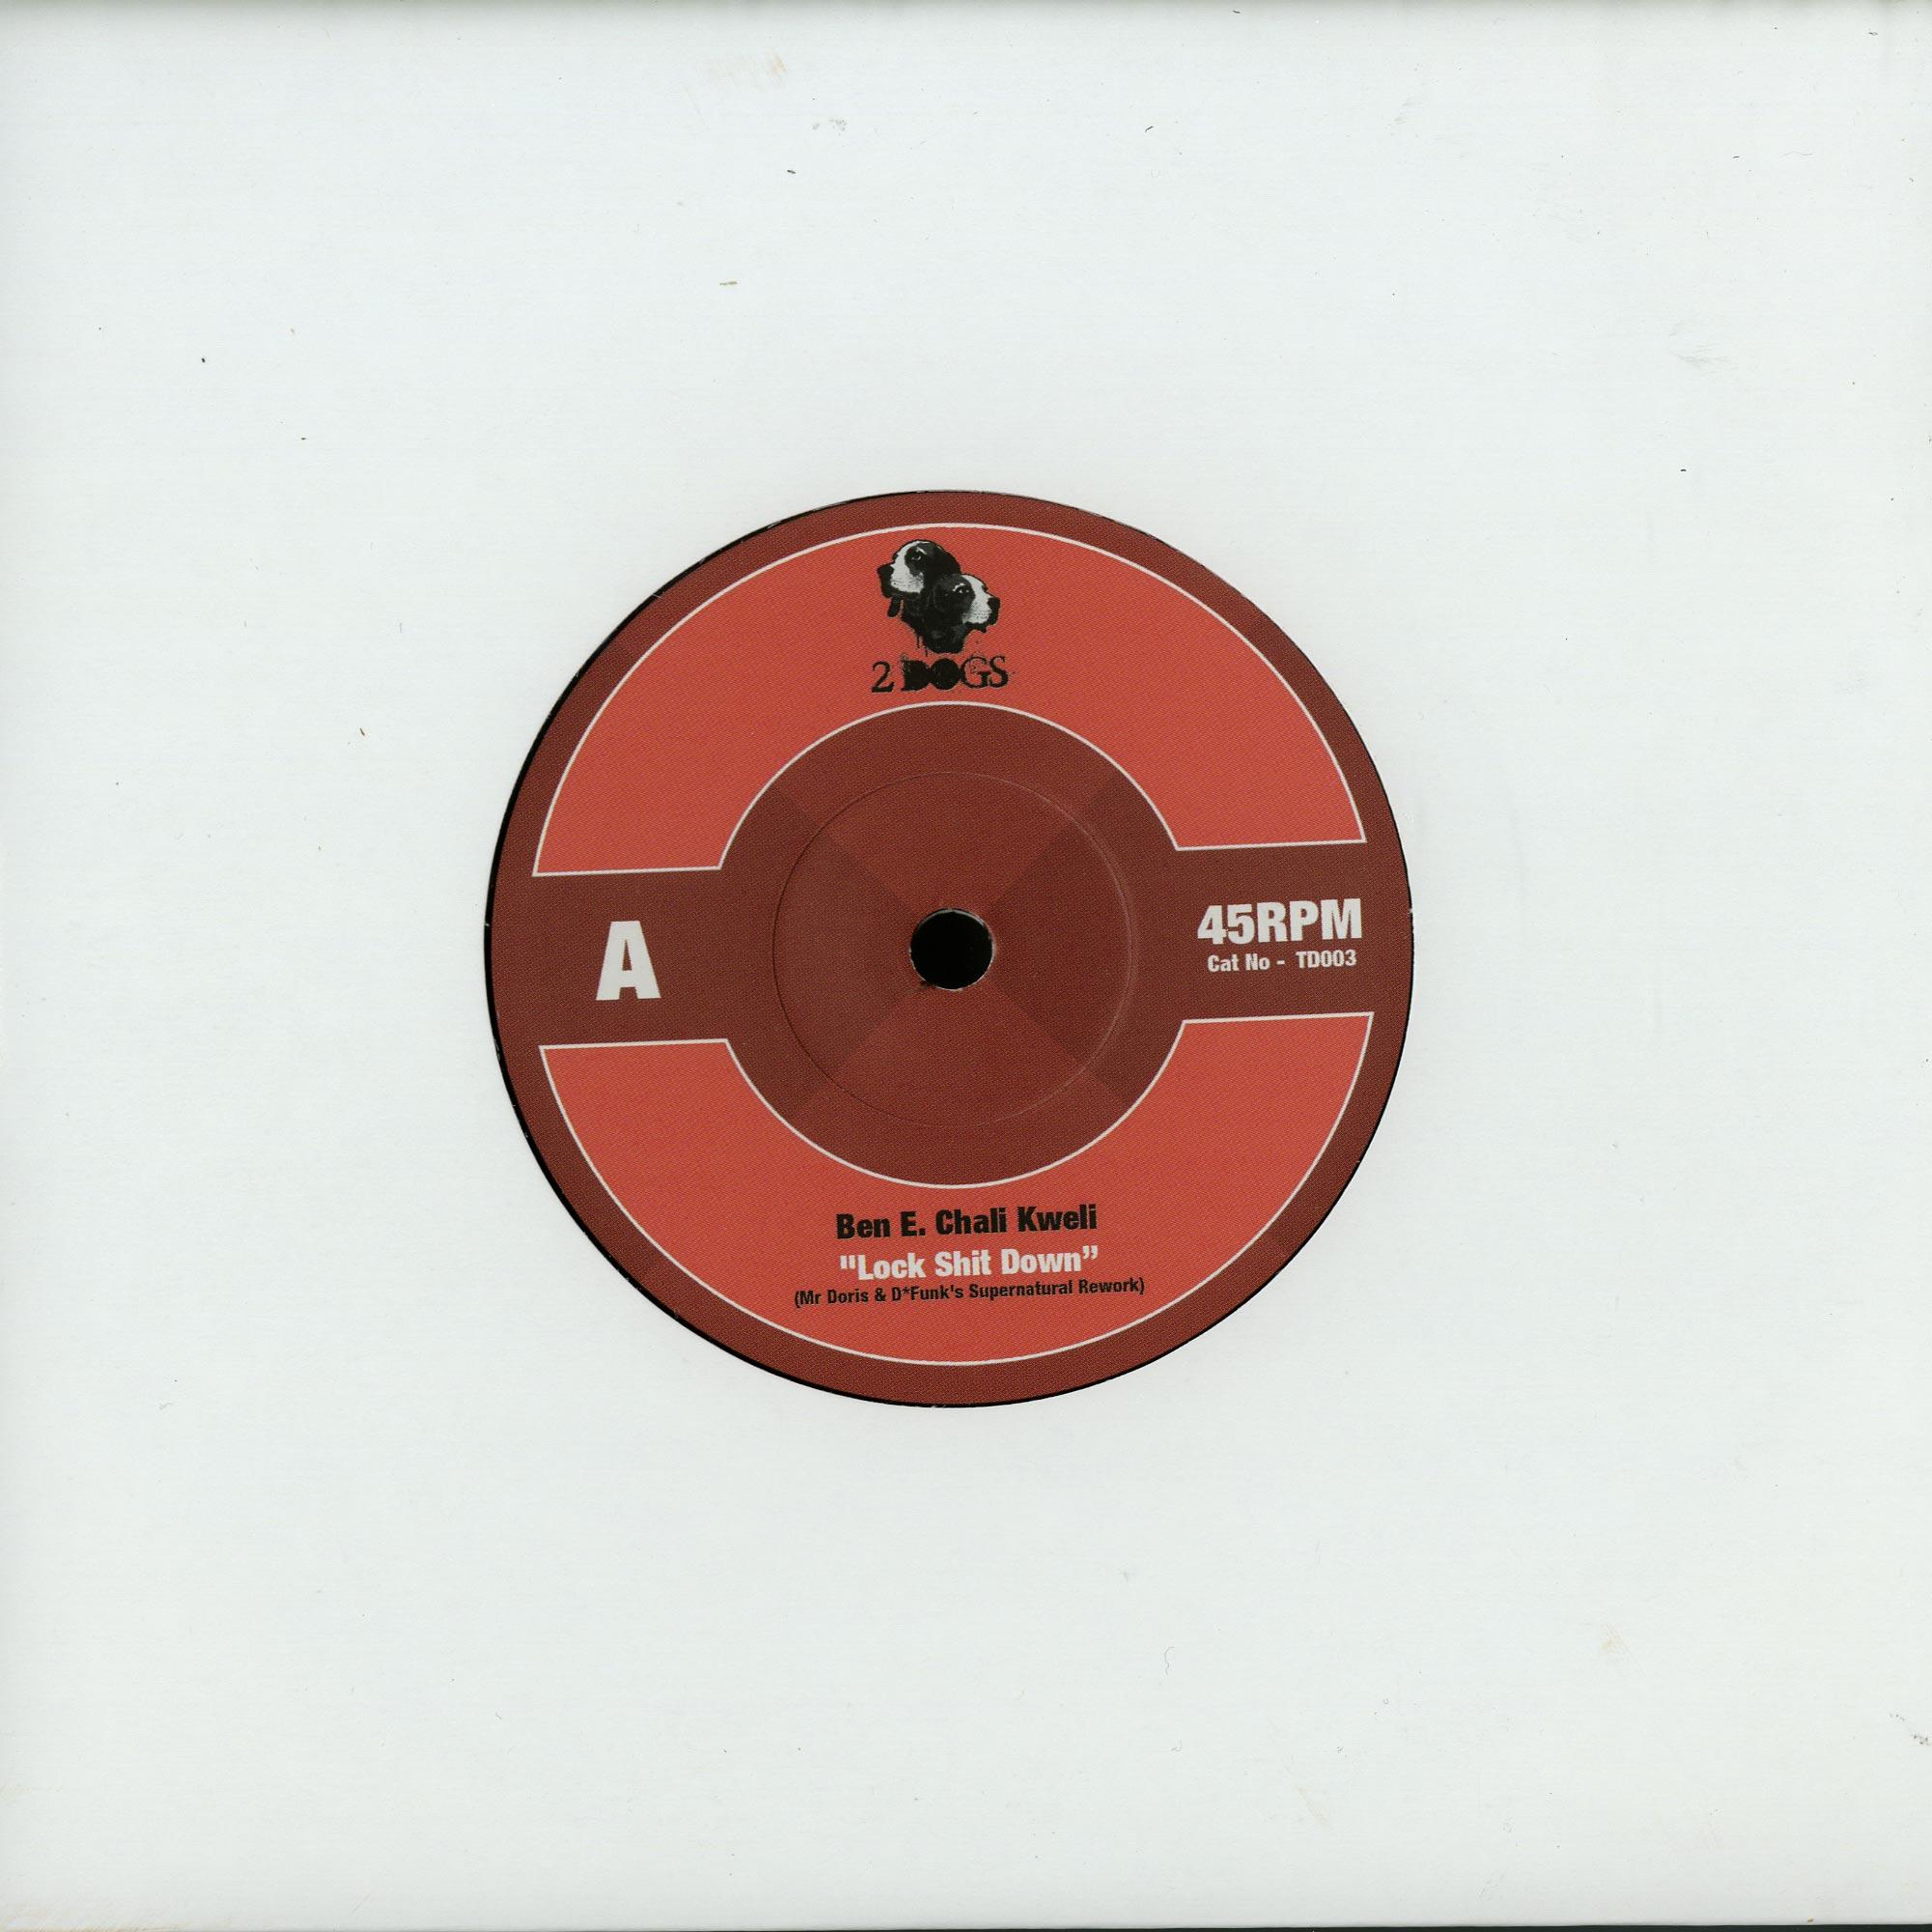 Ben E. Chali Kweli / Digabledrippers - LOCK SHIT DOWN / 9TH WONDER